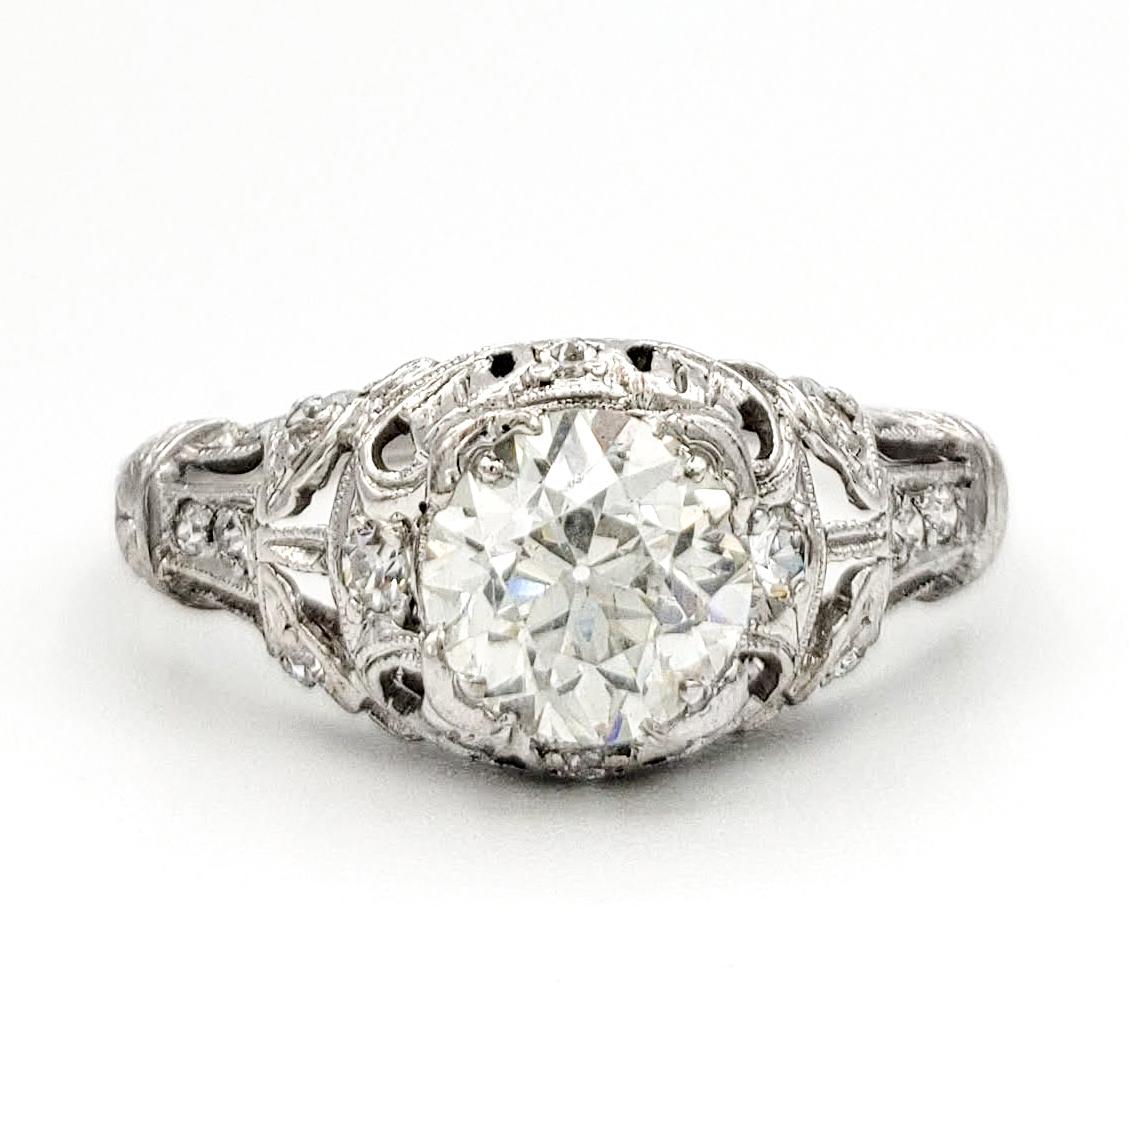 vintage-platinum-engagement-ring-with-0-92-carat-old-european-cut-diamond-egl-h-vs1